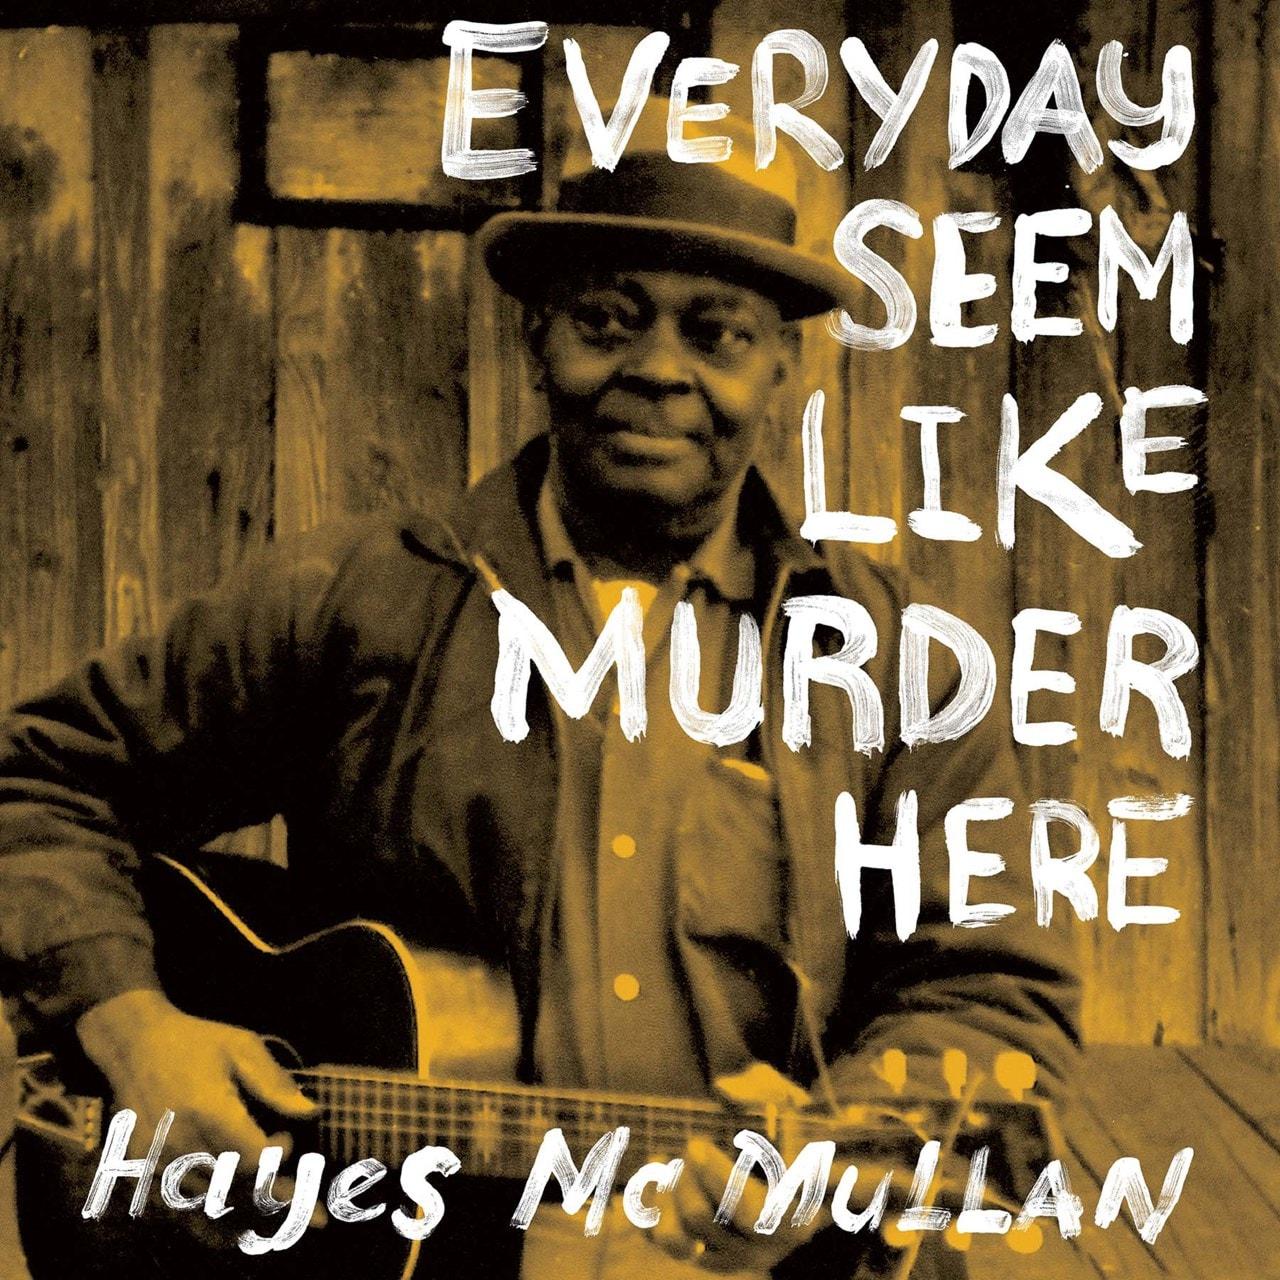 Everyday Seem Like Murder Here - 1